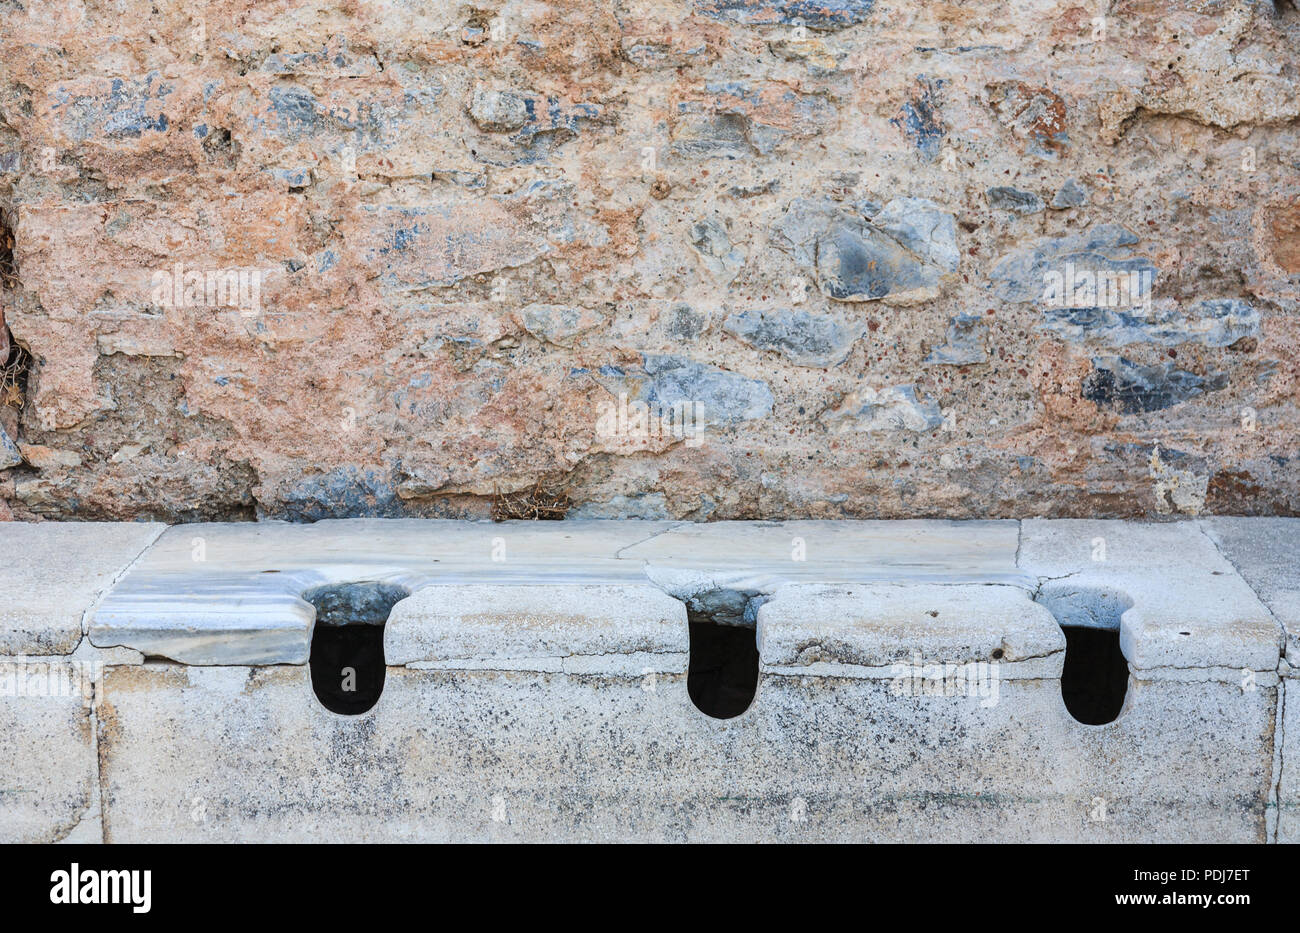 Stone communal toilets at Ephesus, an ancient Greek city settlement archaeological site on the Ionian coast near Selçuk, Izmir Province, Turkey Stock Photo